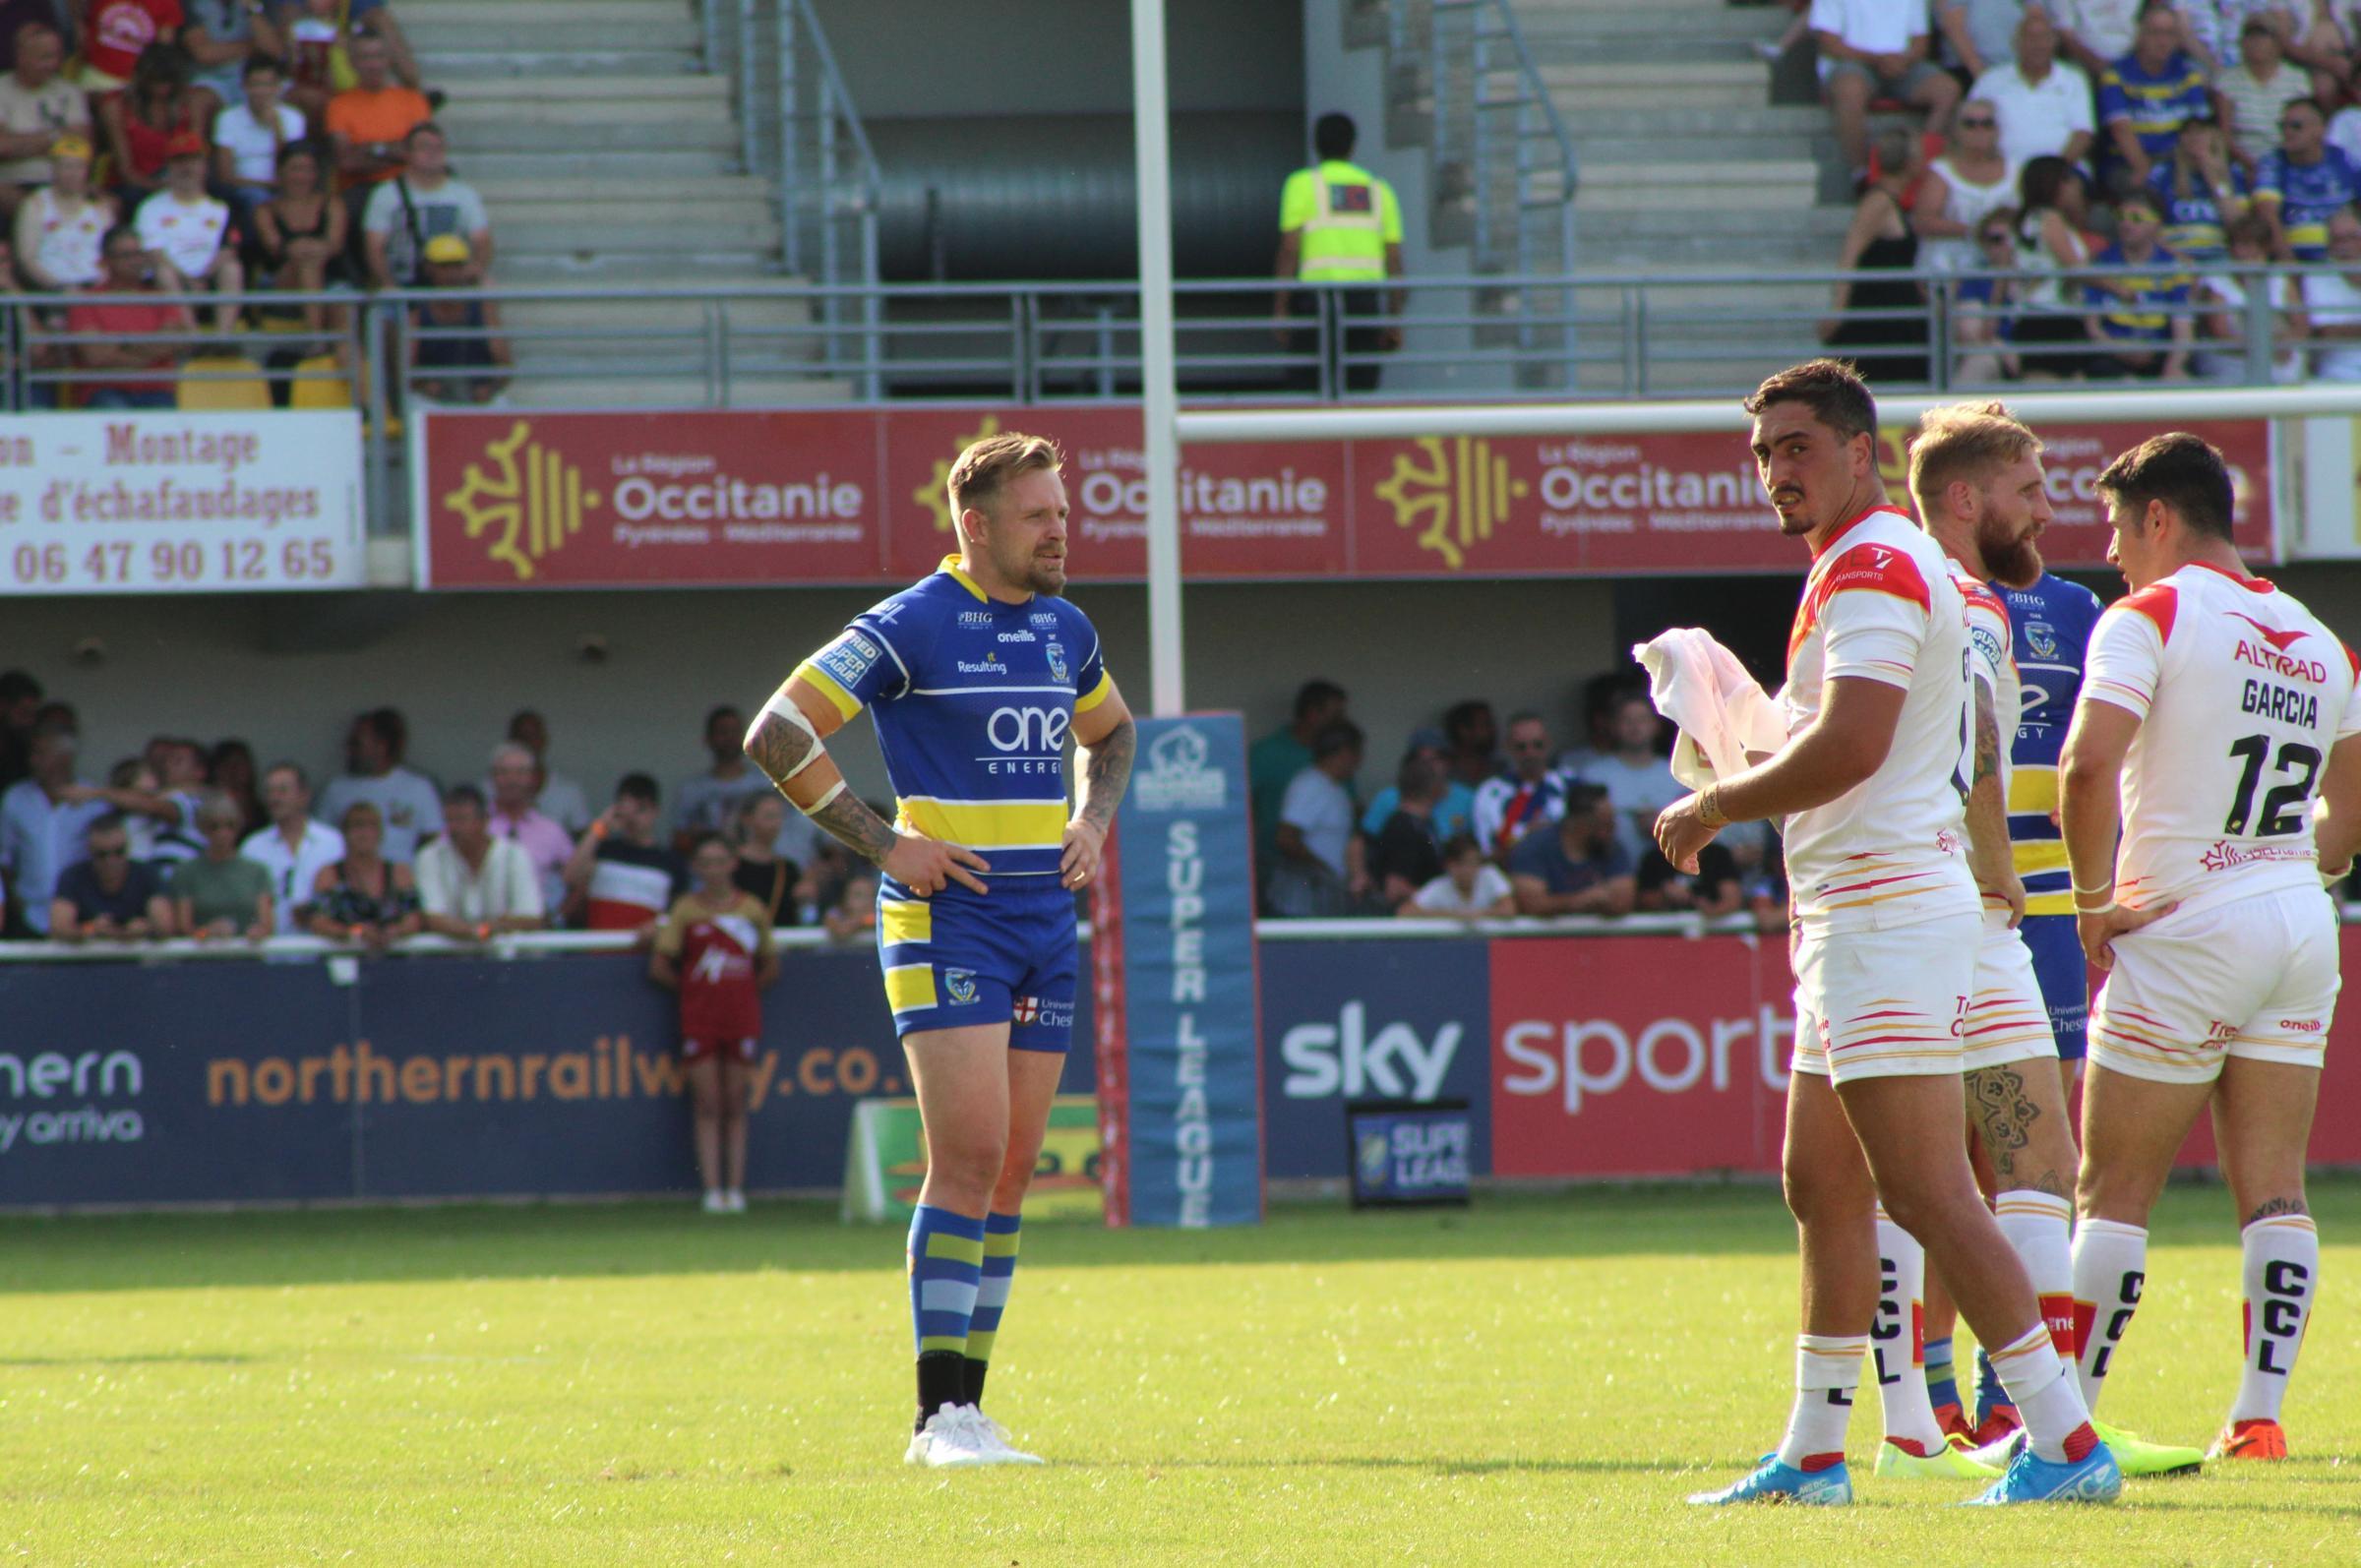 Blake Austin injury update ahead of Challenge Cup final